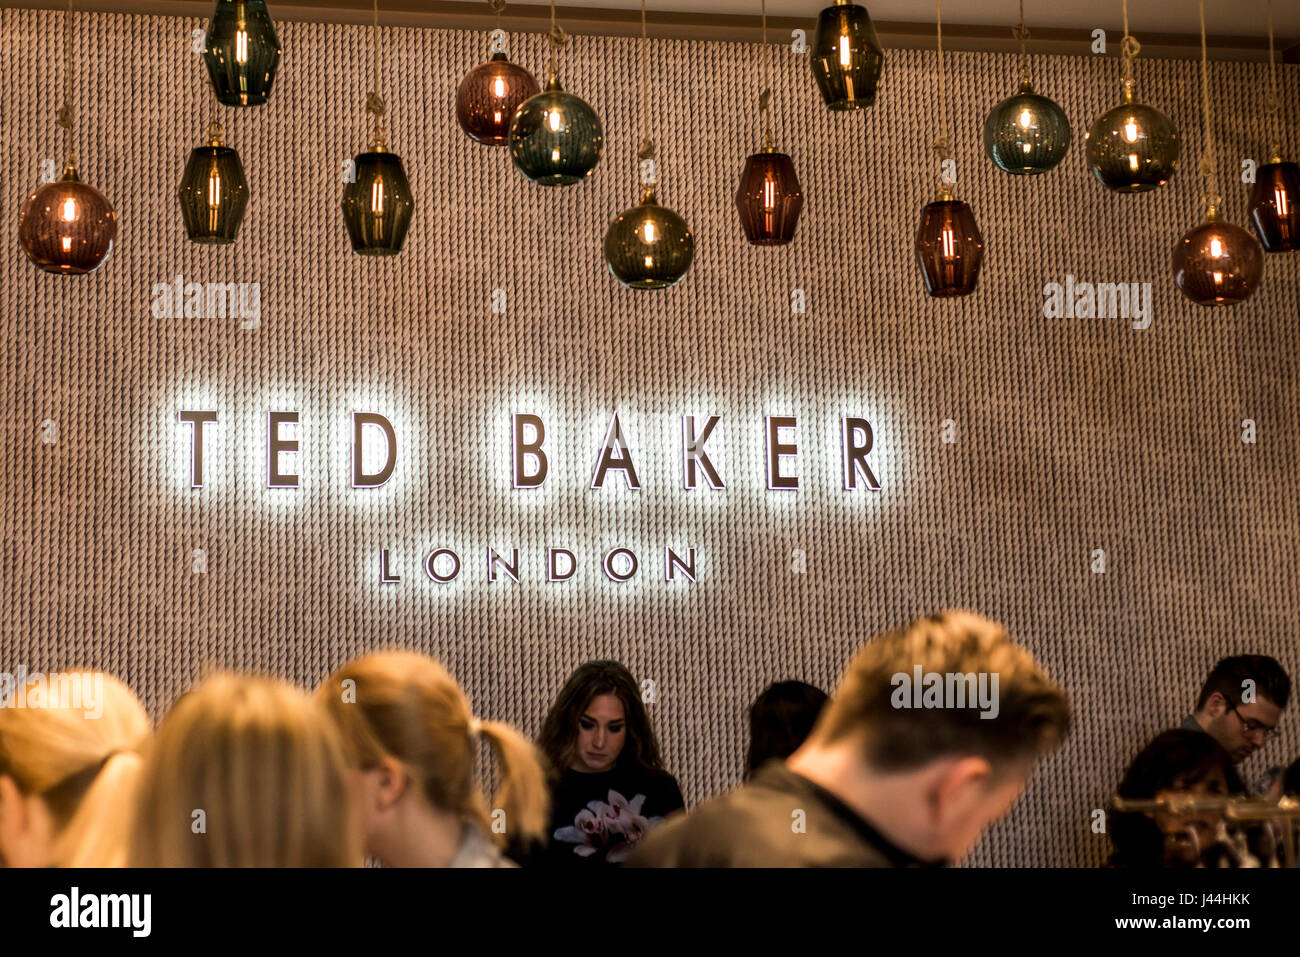 31f827c47 Roermond Netherlands 07.05.2017 - Logo people shopping Ted Baker London  Store Mc Arthur Glen Designer Outlet shopping area